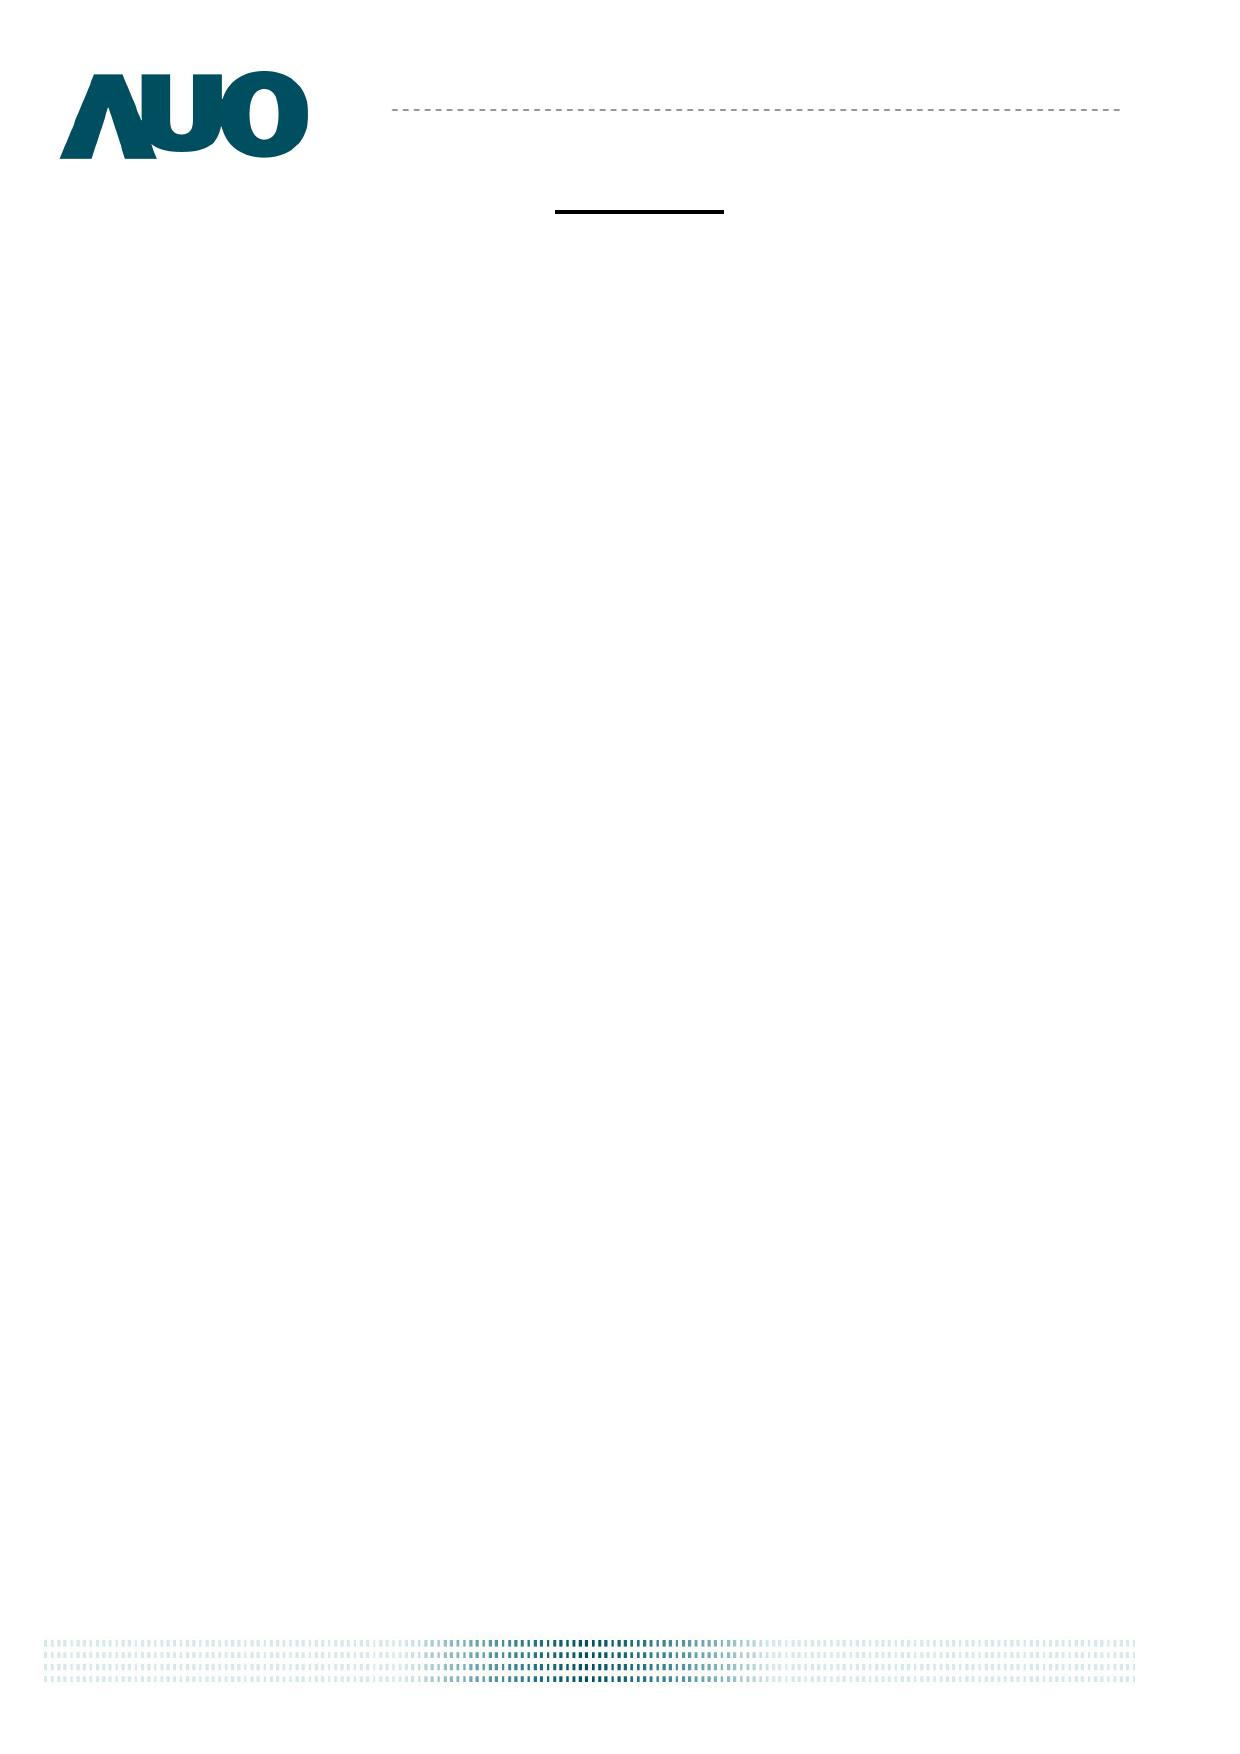 G057QN01-V0 Даташит, Описание, Даташиты